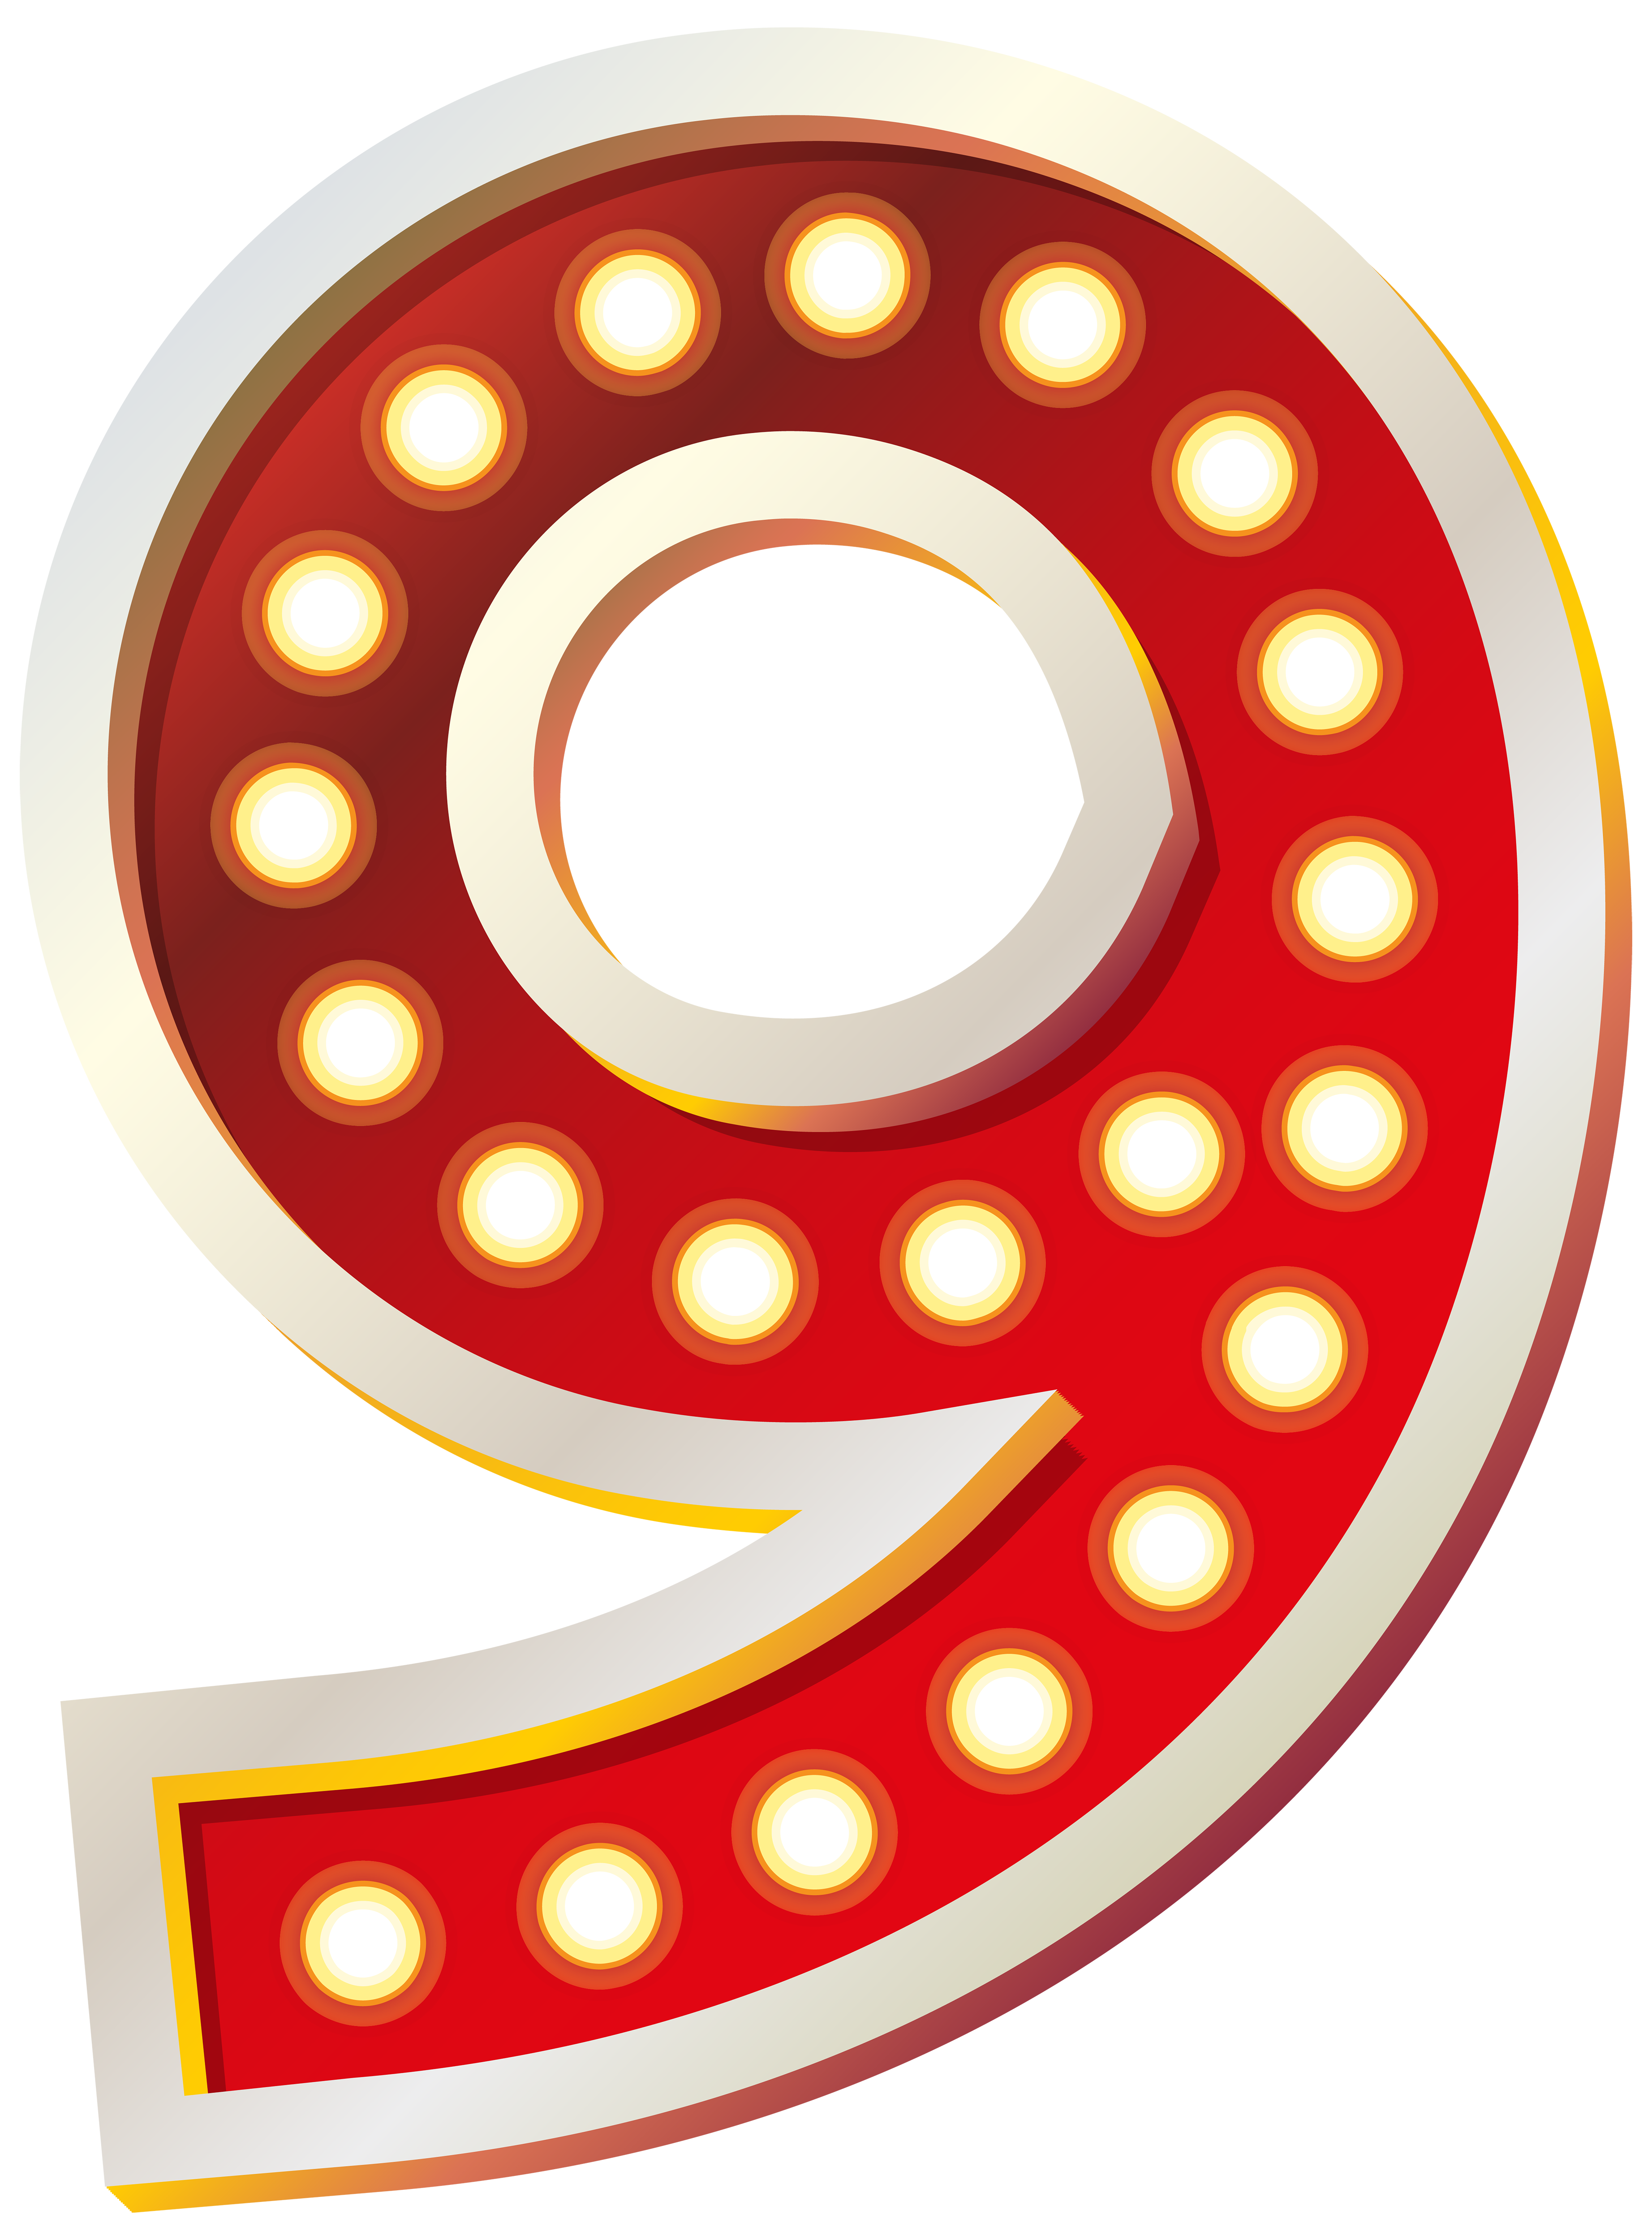 Red Number Nine with Lights PNG Clip Art Image.